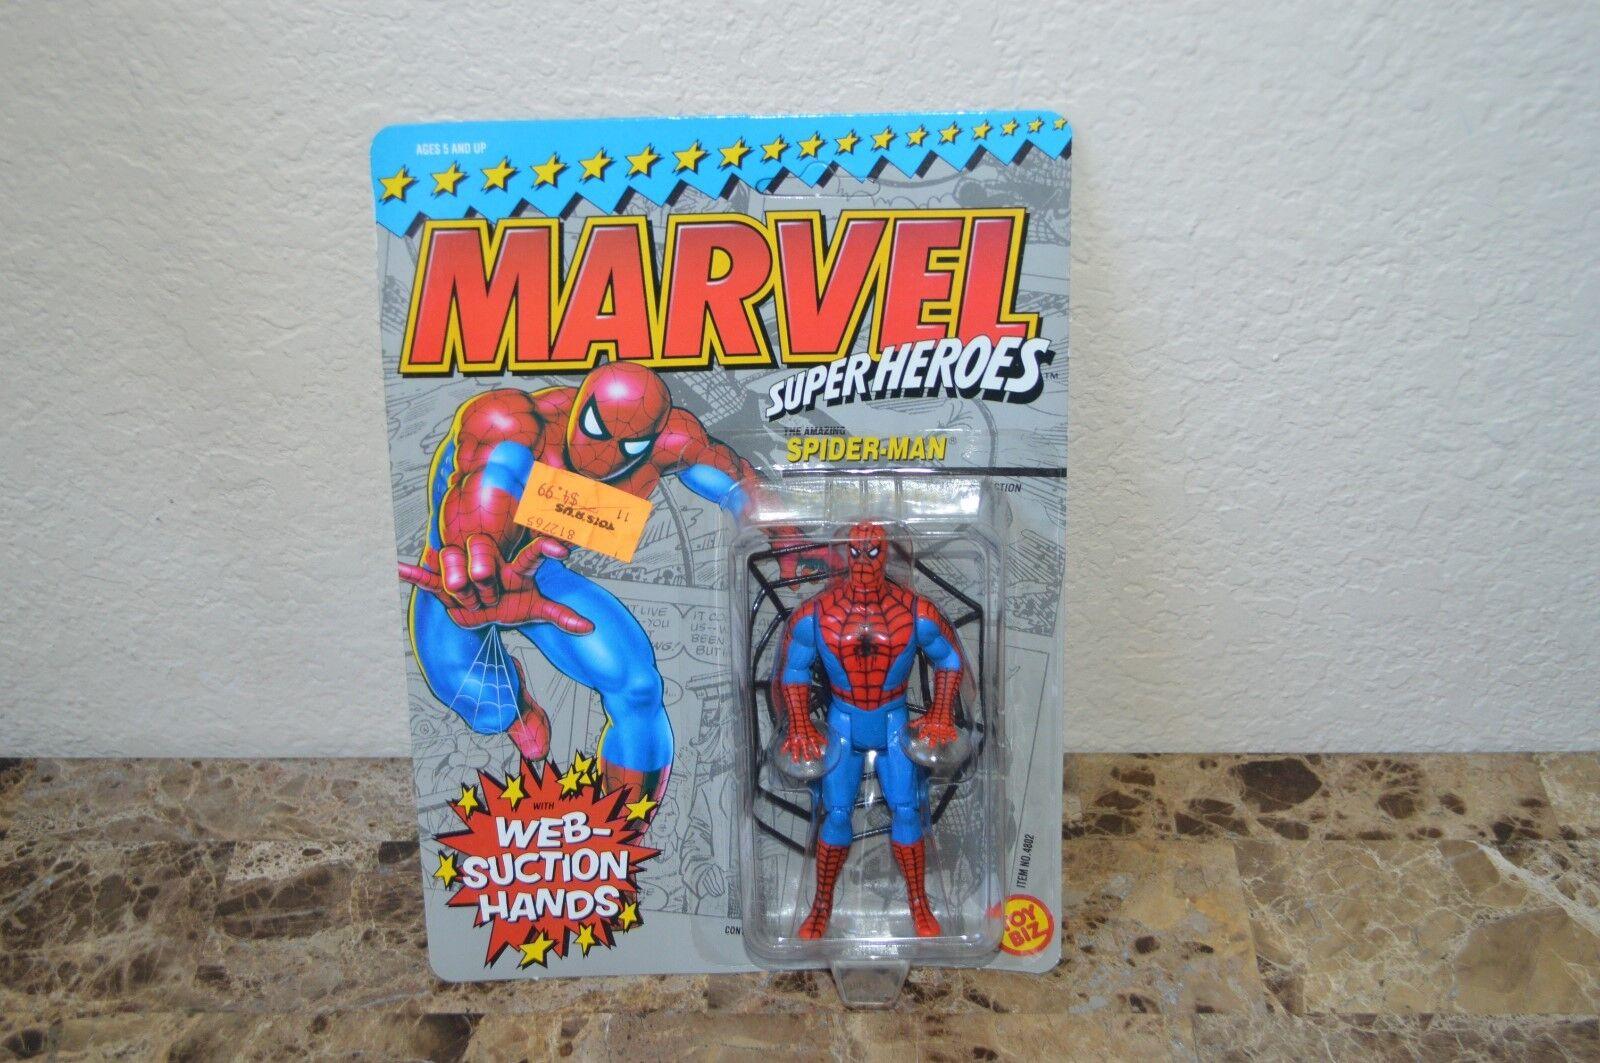 Vintage Marvel Giocattolo Biz Supereroi Spider-Man + Web Aspirazione Hands